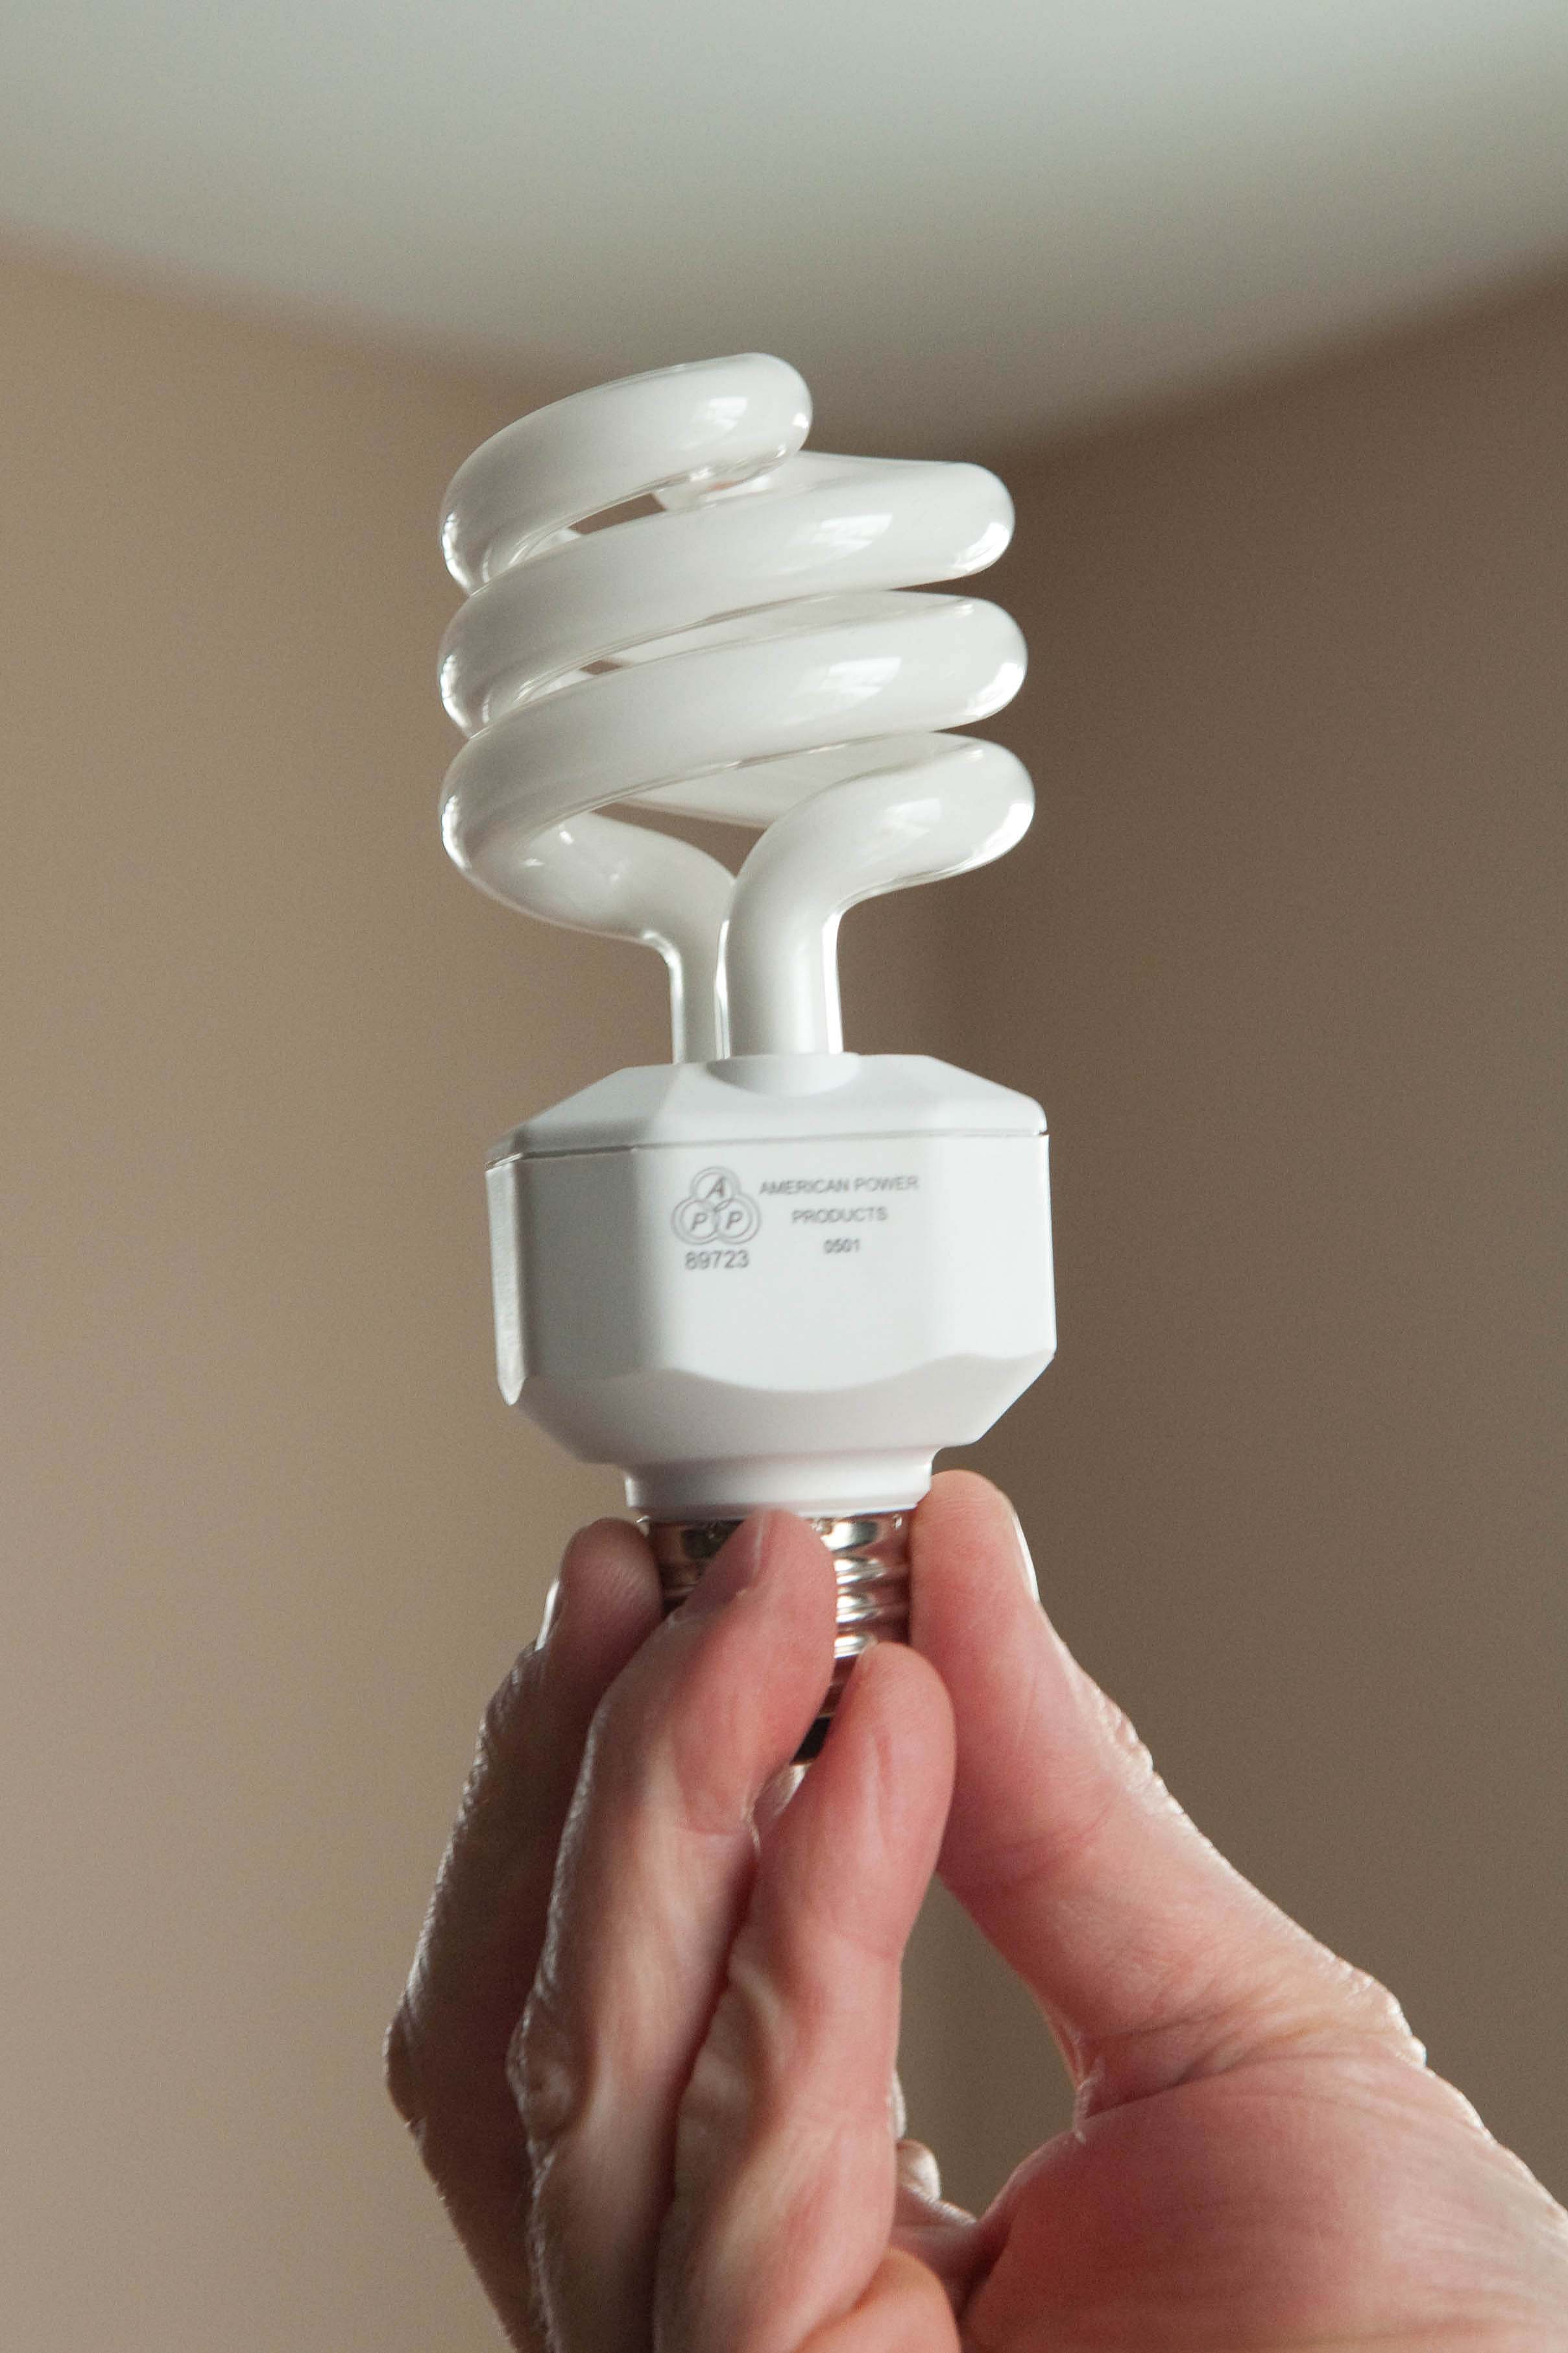 los cinco mejores gadgets para ahorrar energ a ahorro de energ a. Black Bedroom Furniture Sets. Home Design Ideas